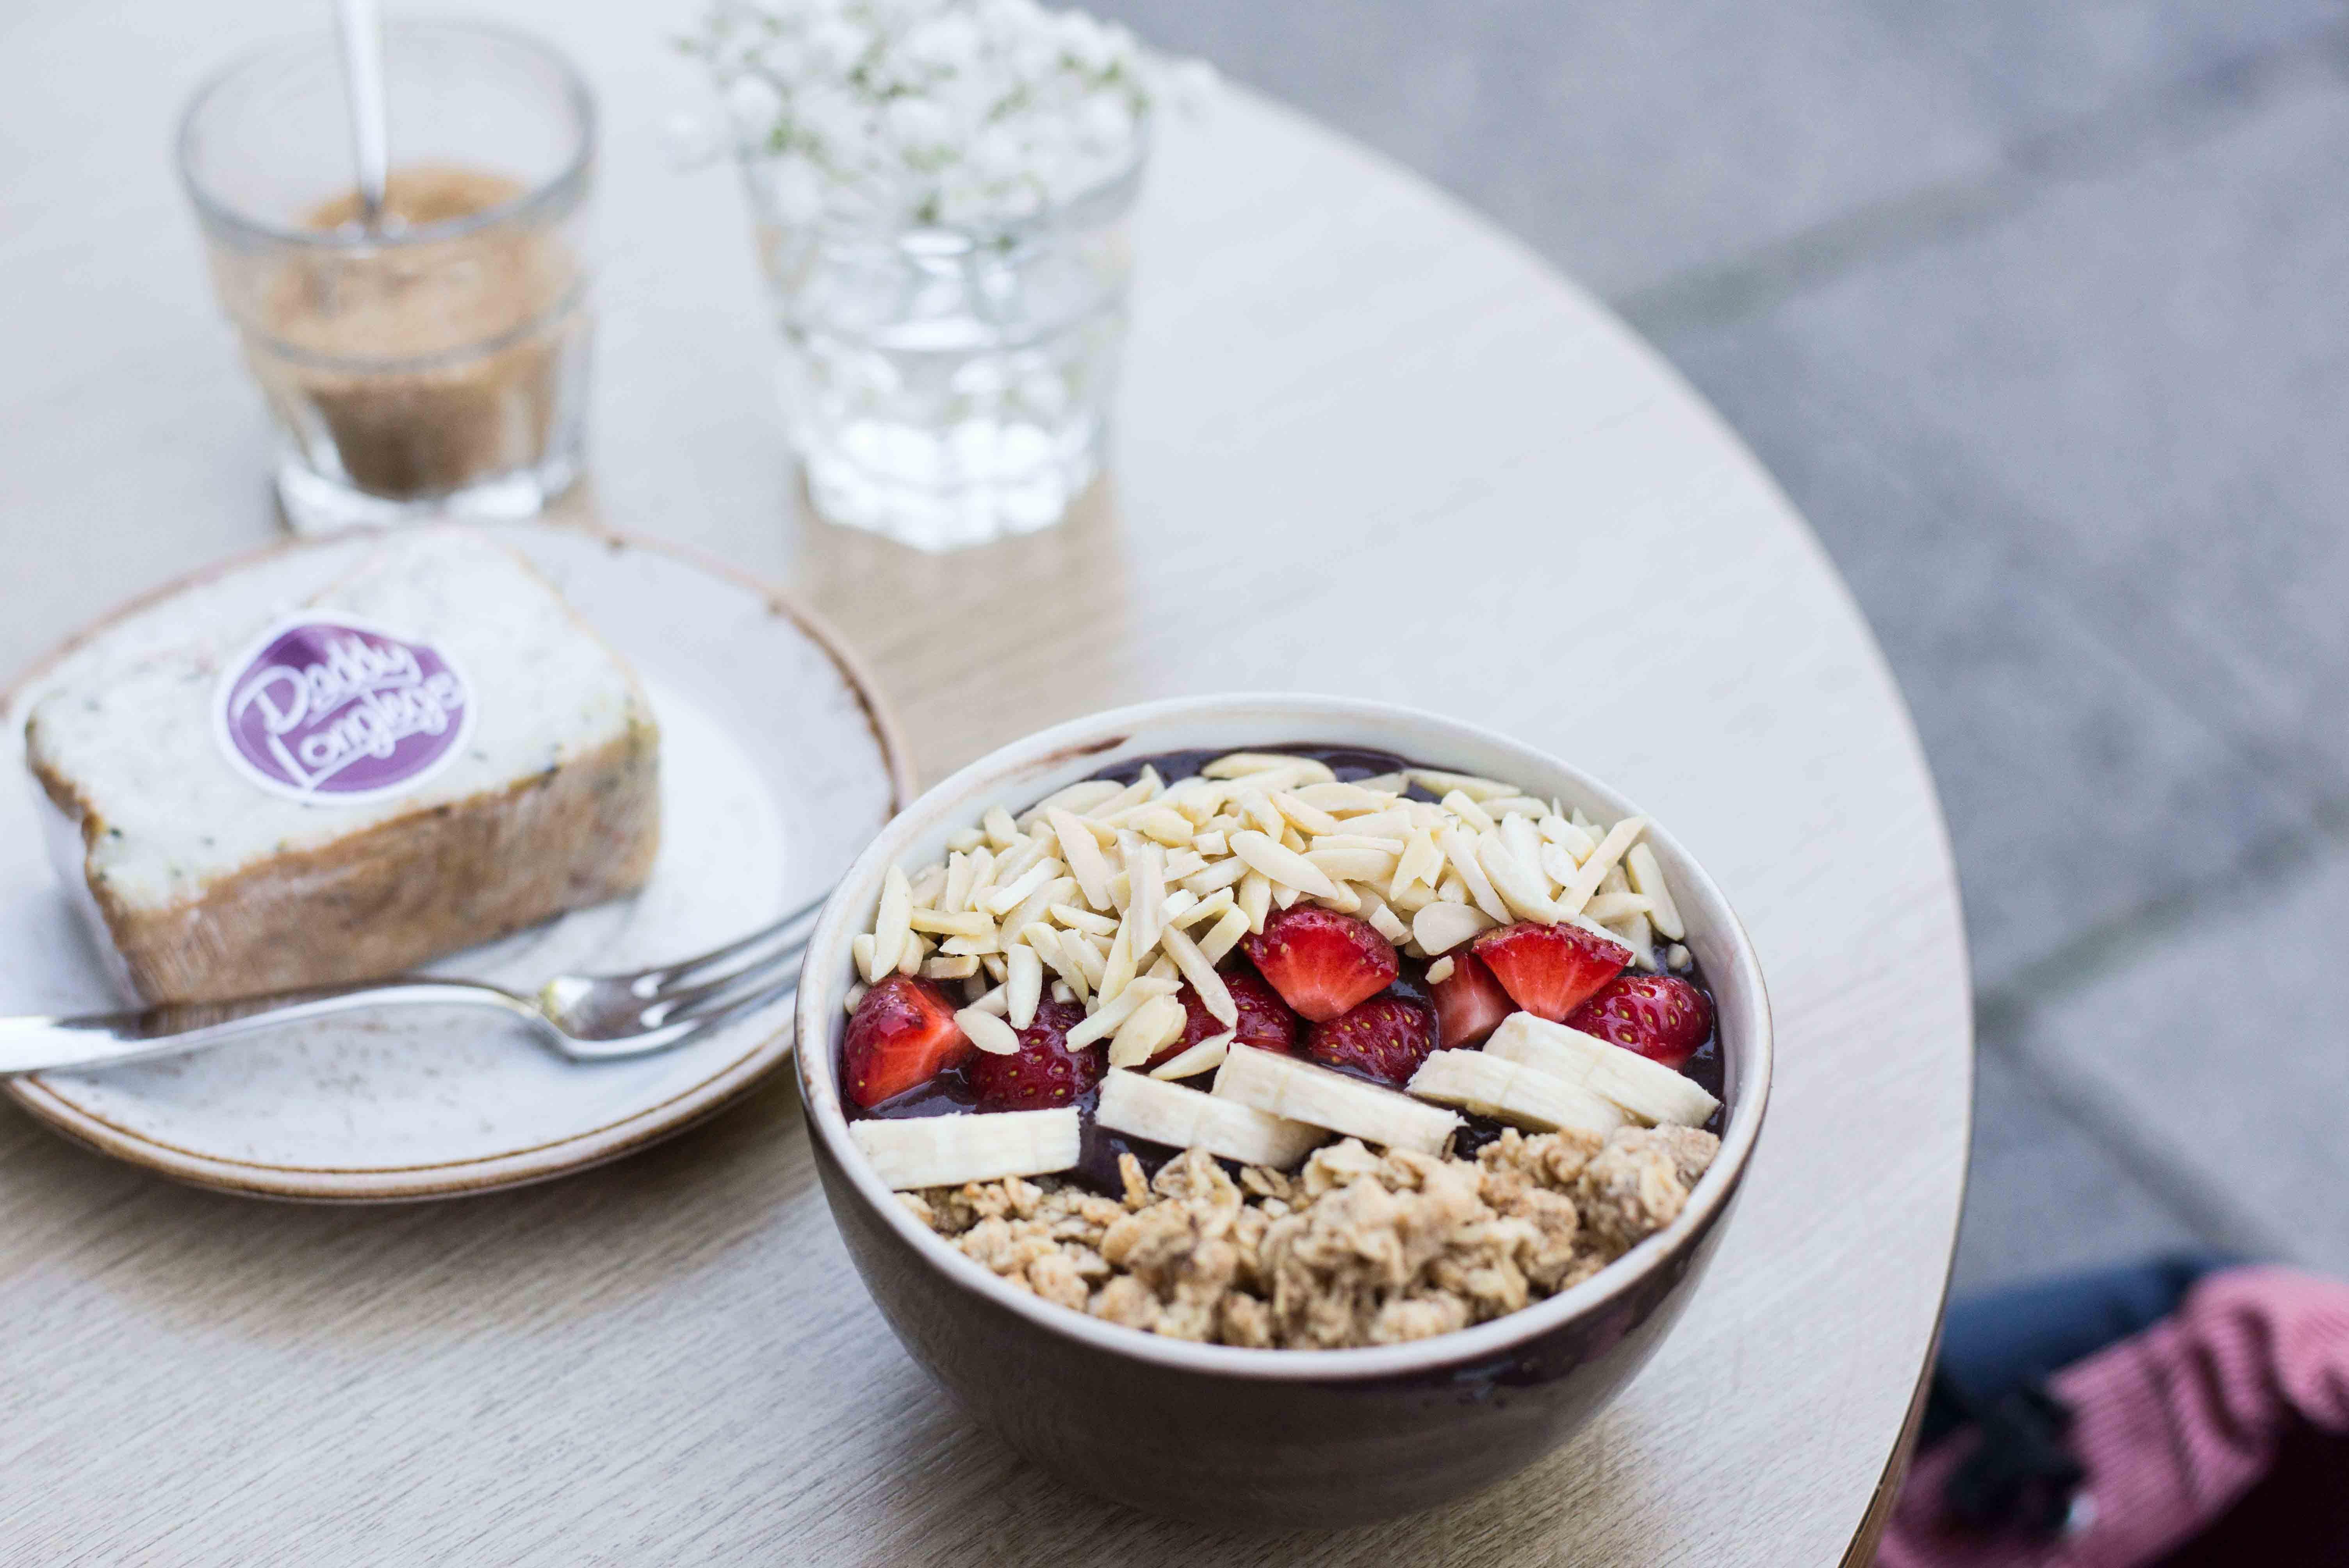 Veganes Fruhstuck In Munchen 7 Tipps Fur Pflanzenesser